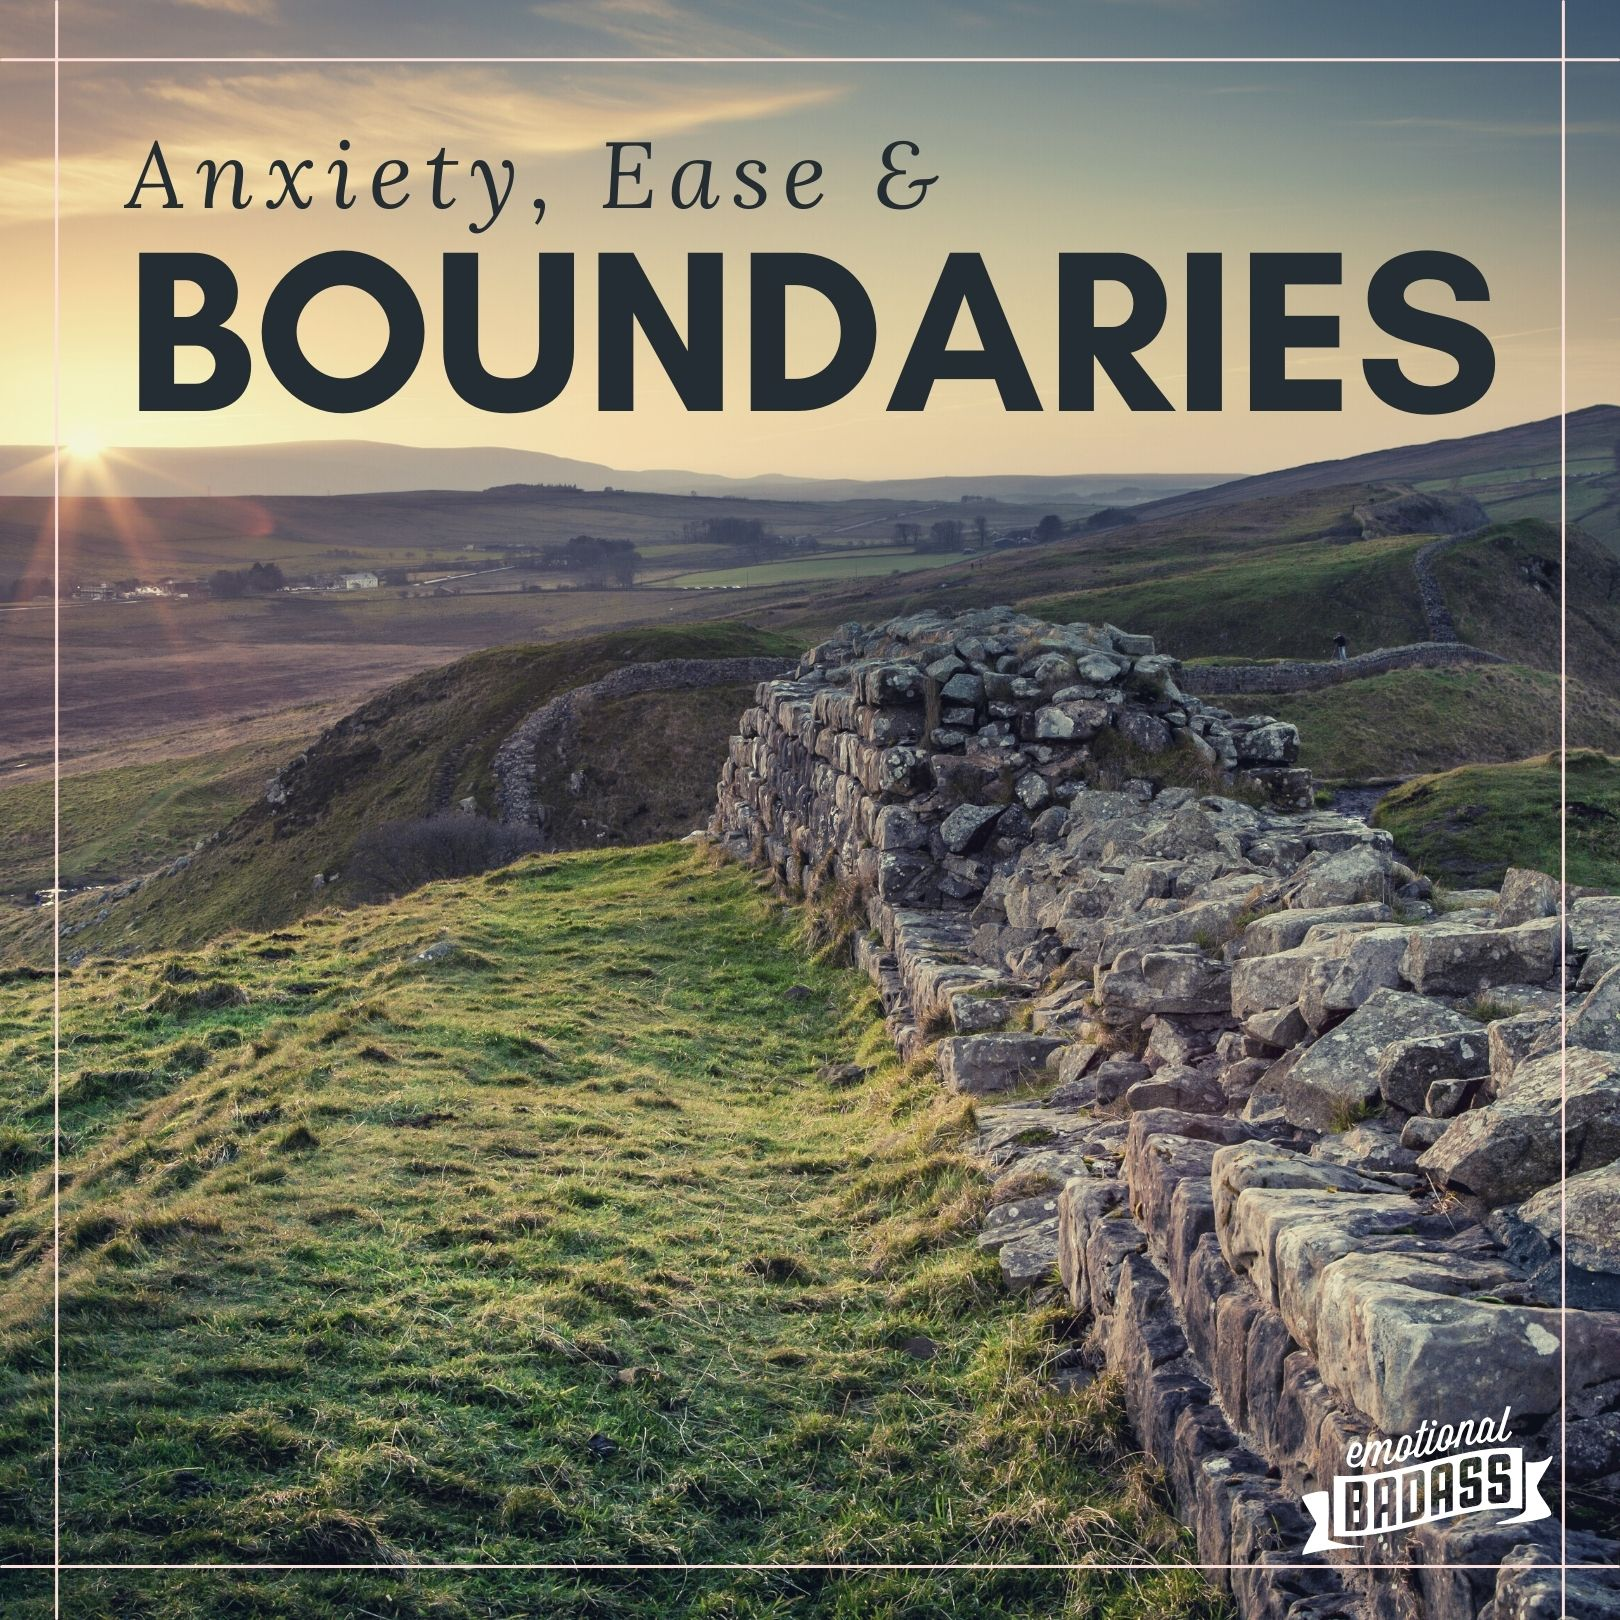 Anxiety, Ease, & Boundaries